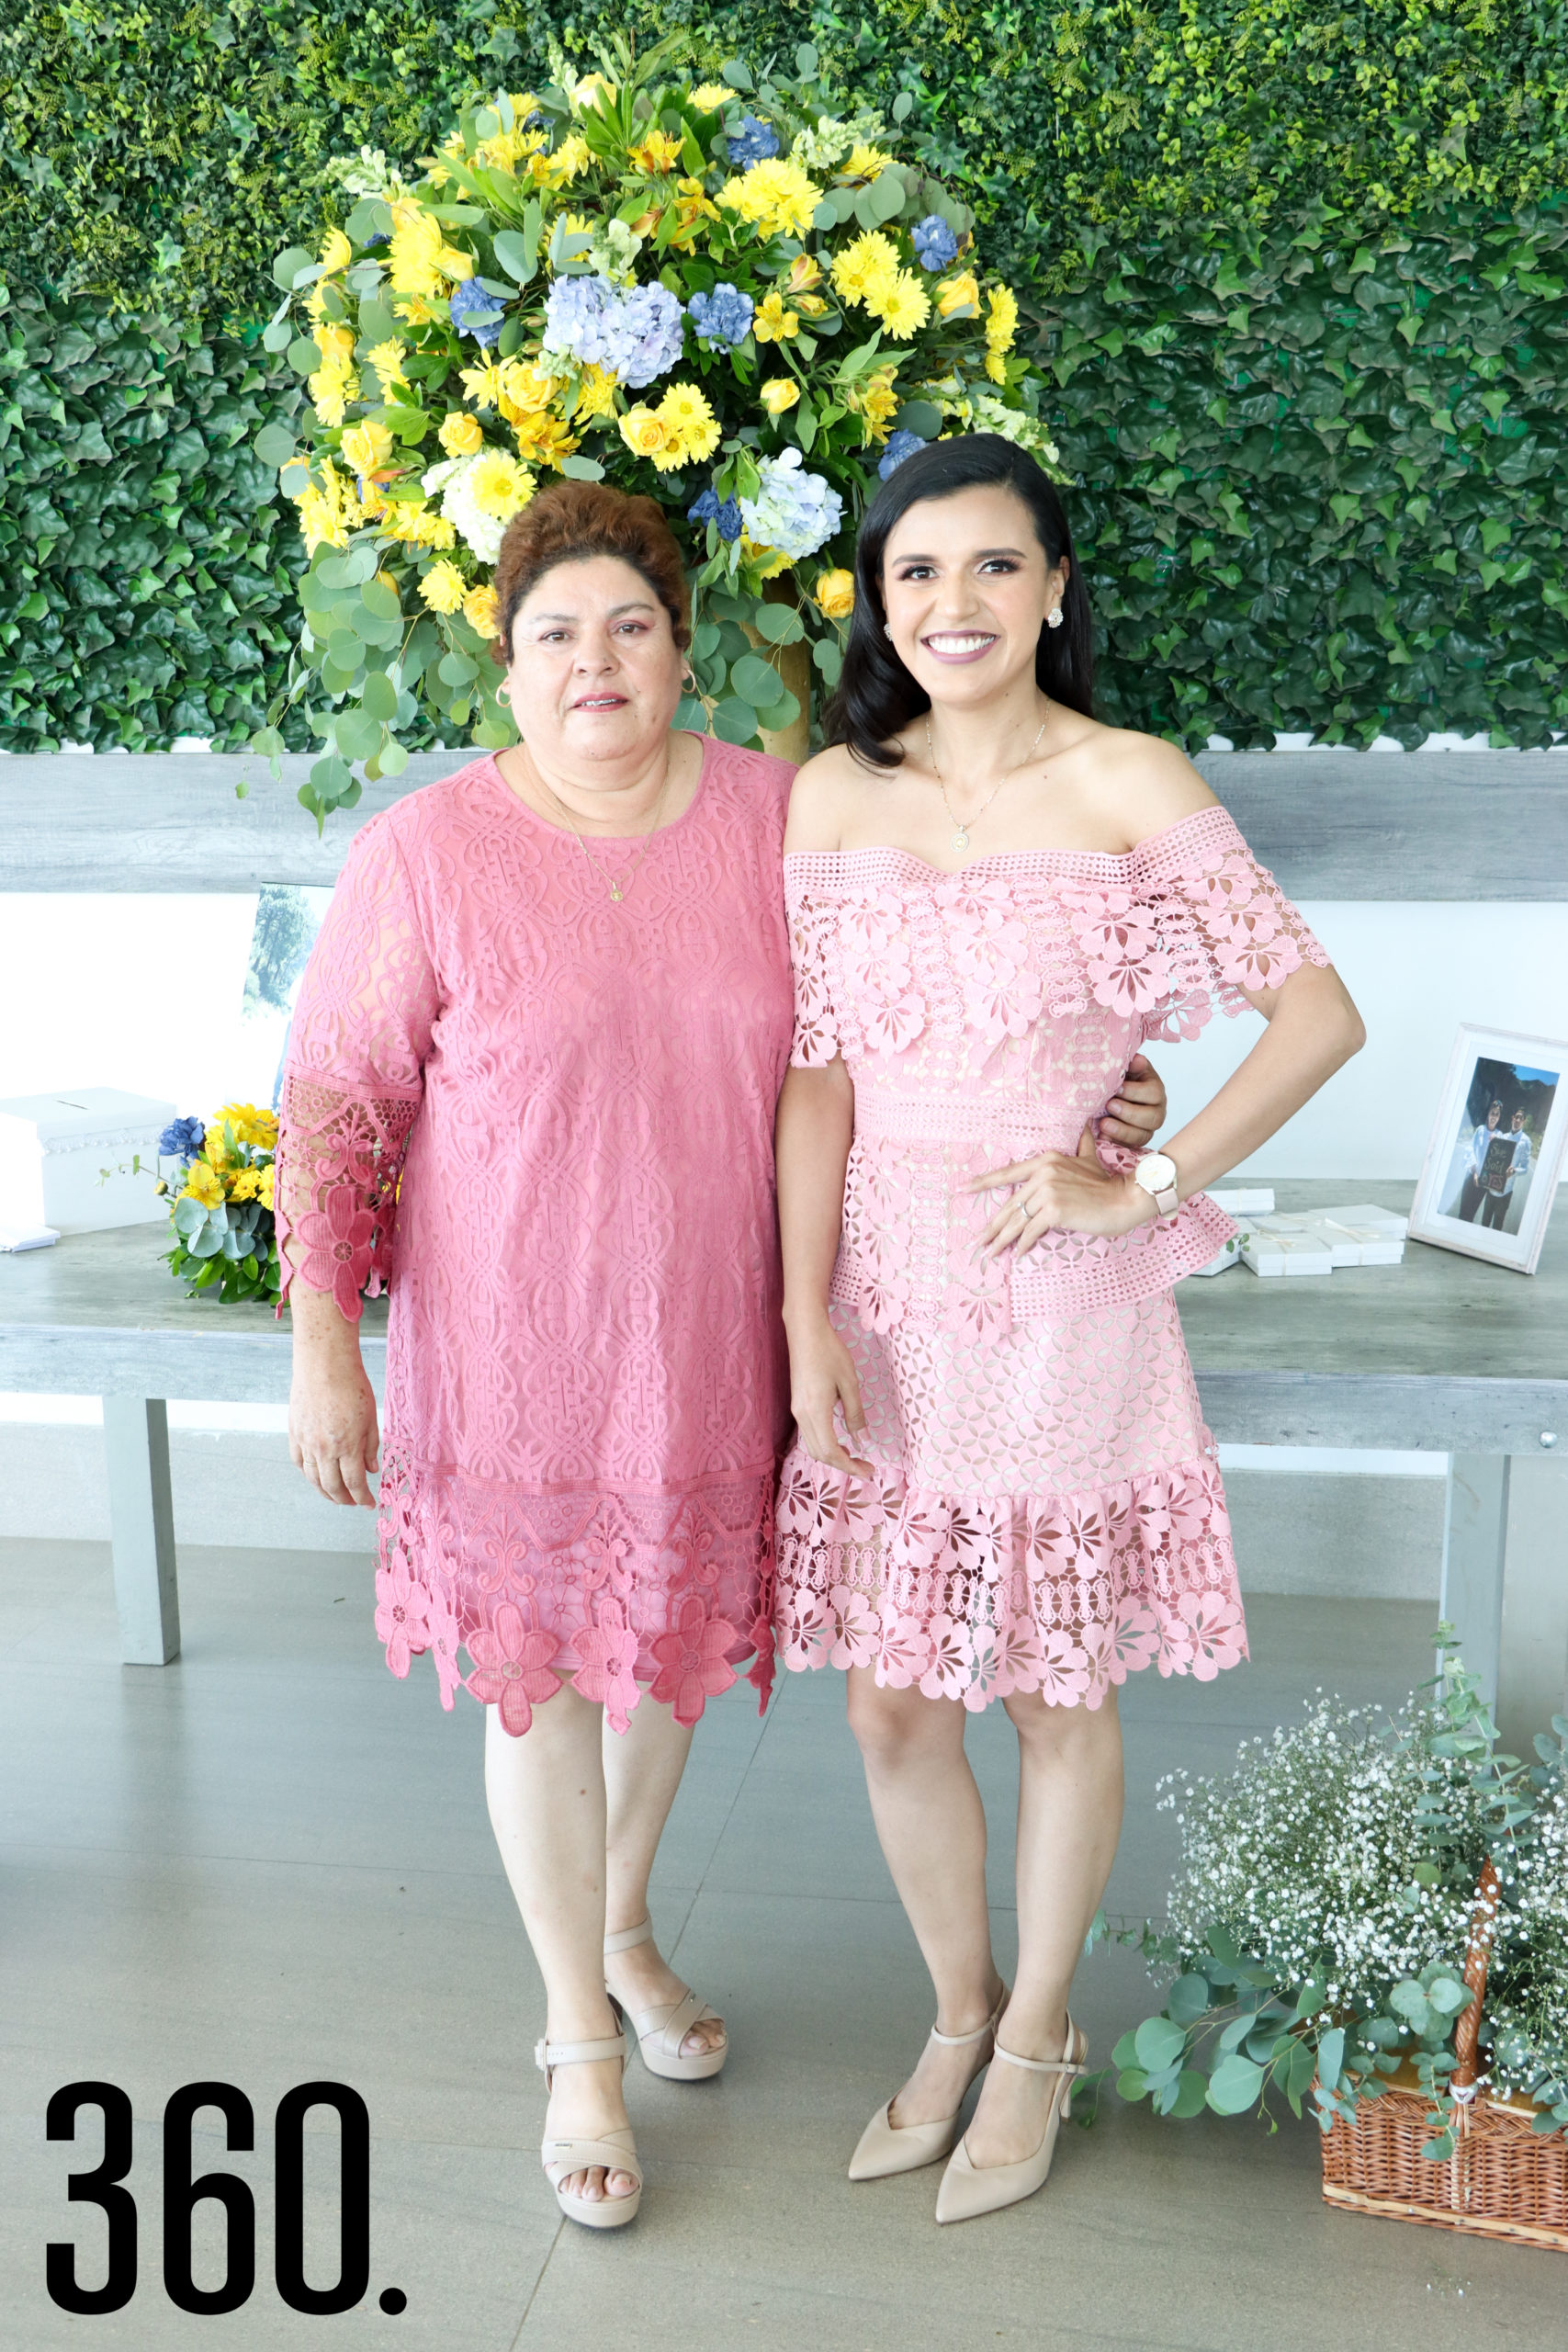 Sheila con su madre, Justina Orozco.